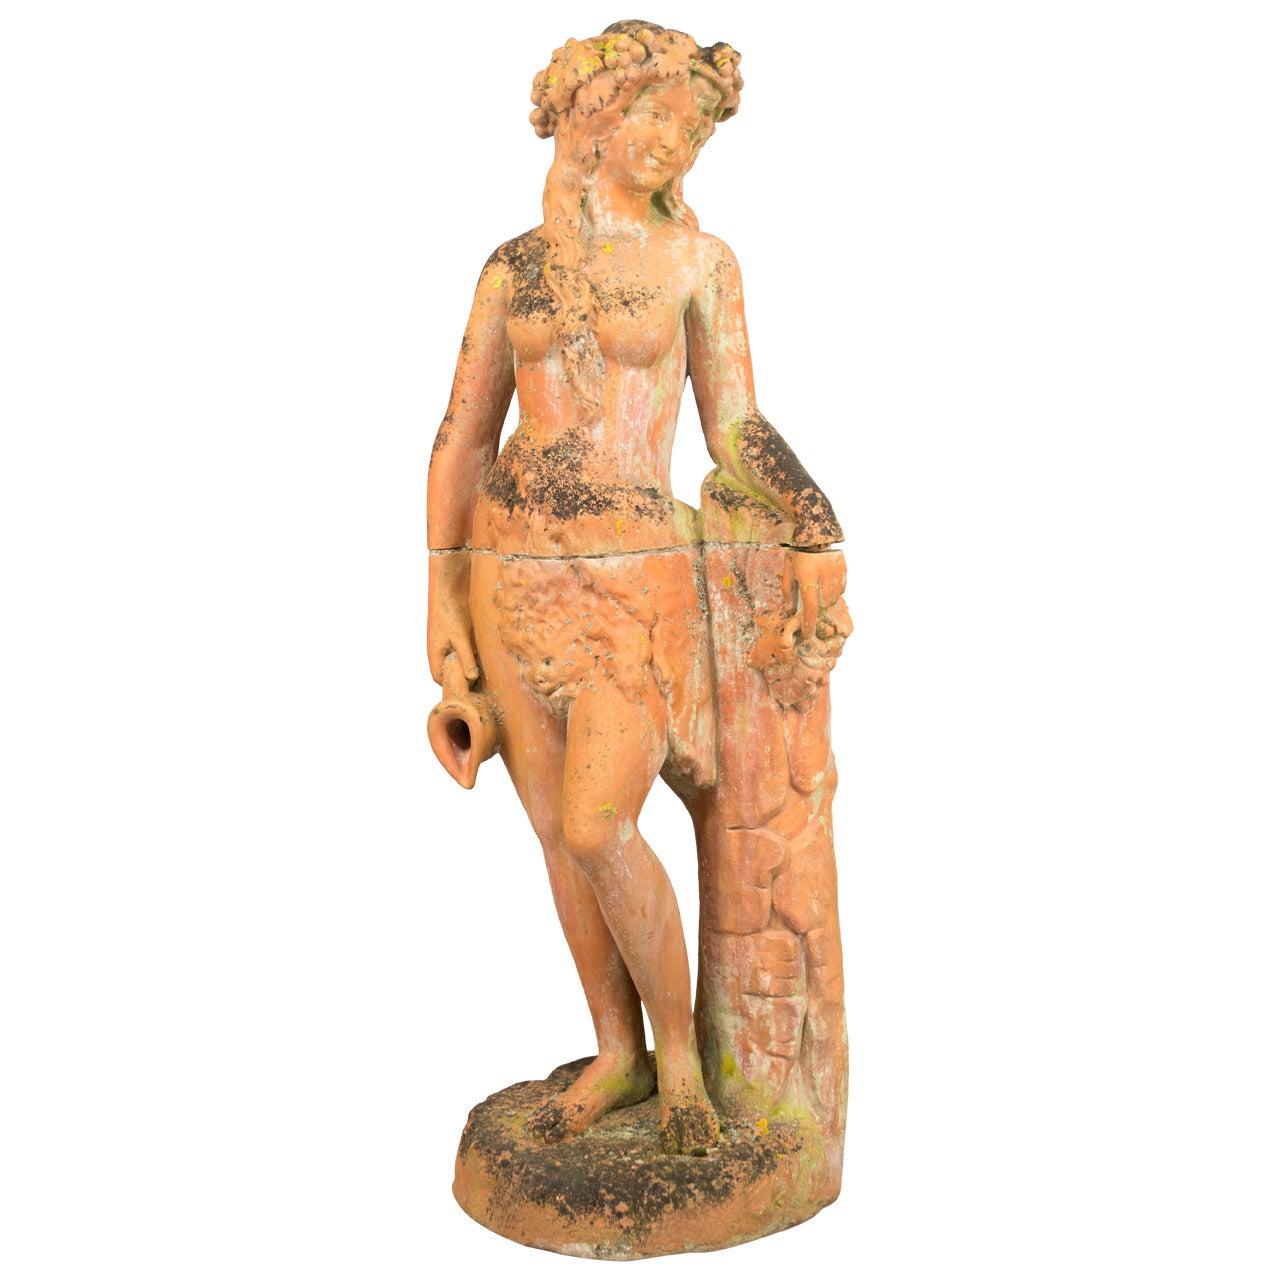 Antique Italian Terracotta Garden Statue